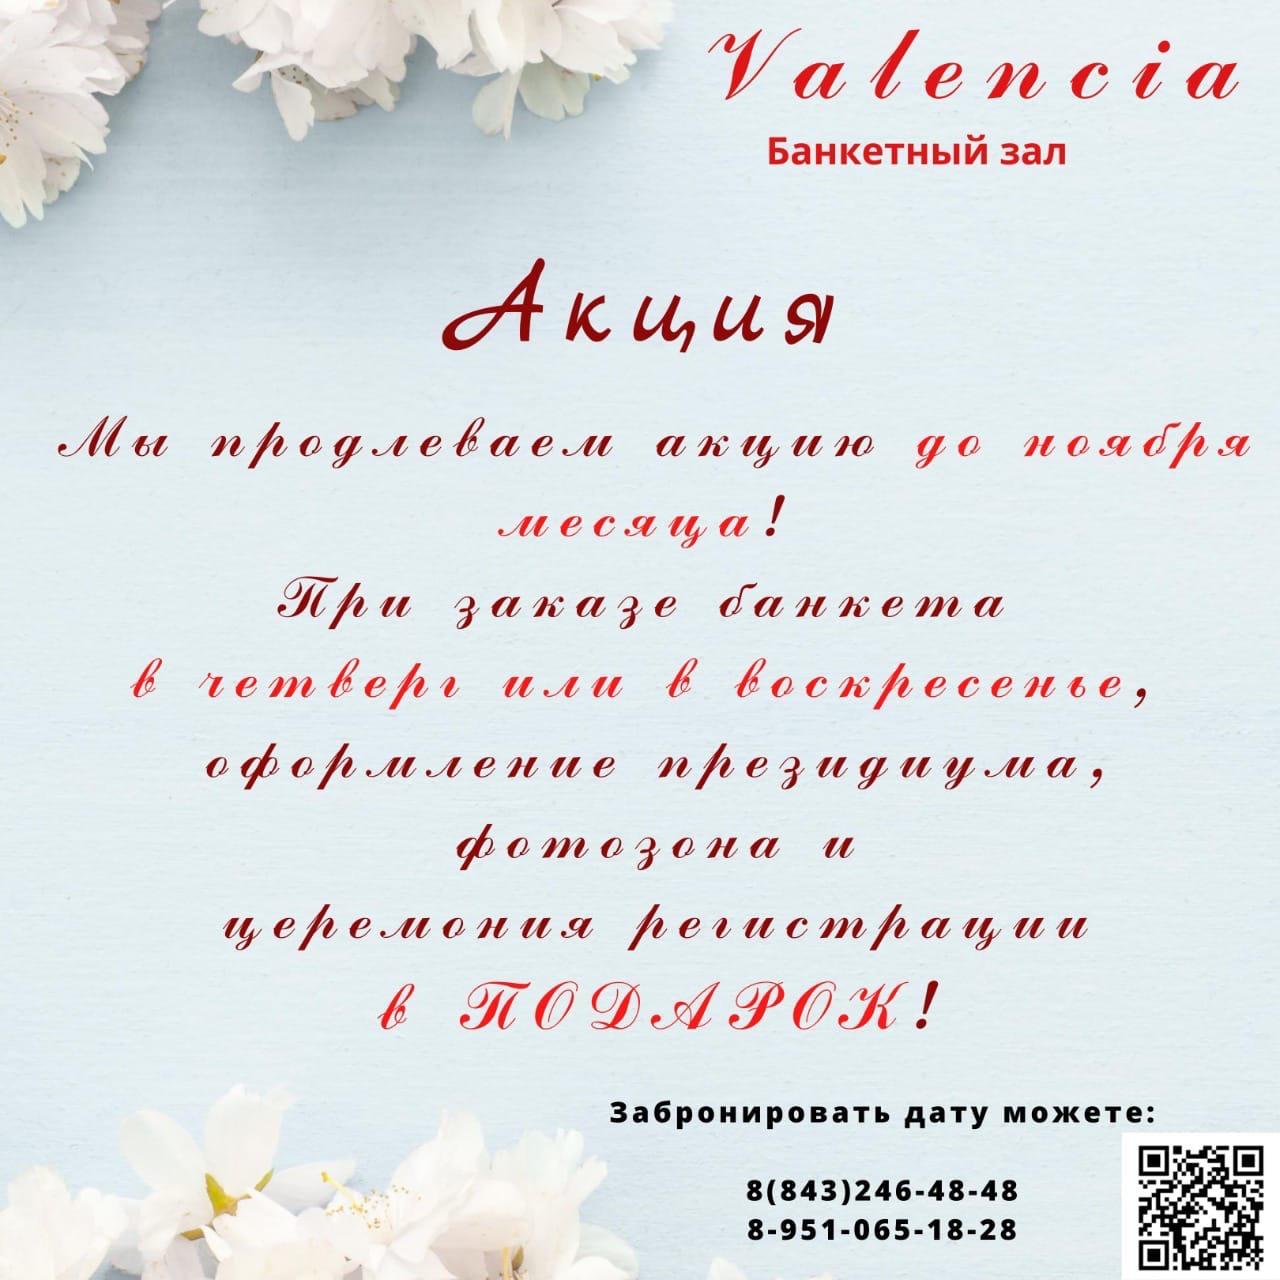 Банкетный зал «Валенсия» - Вконтакте